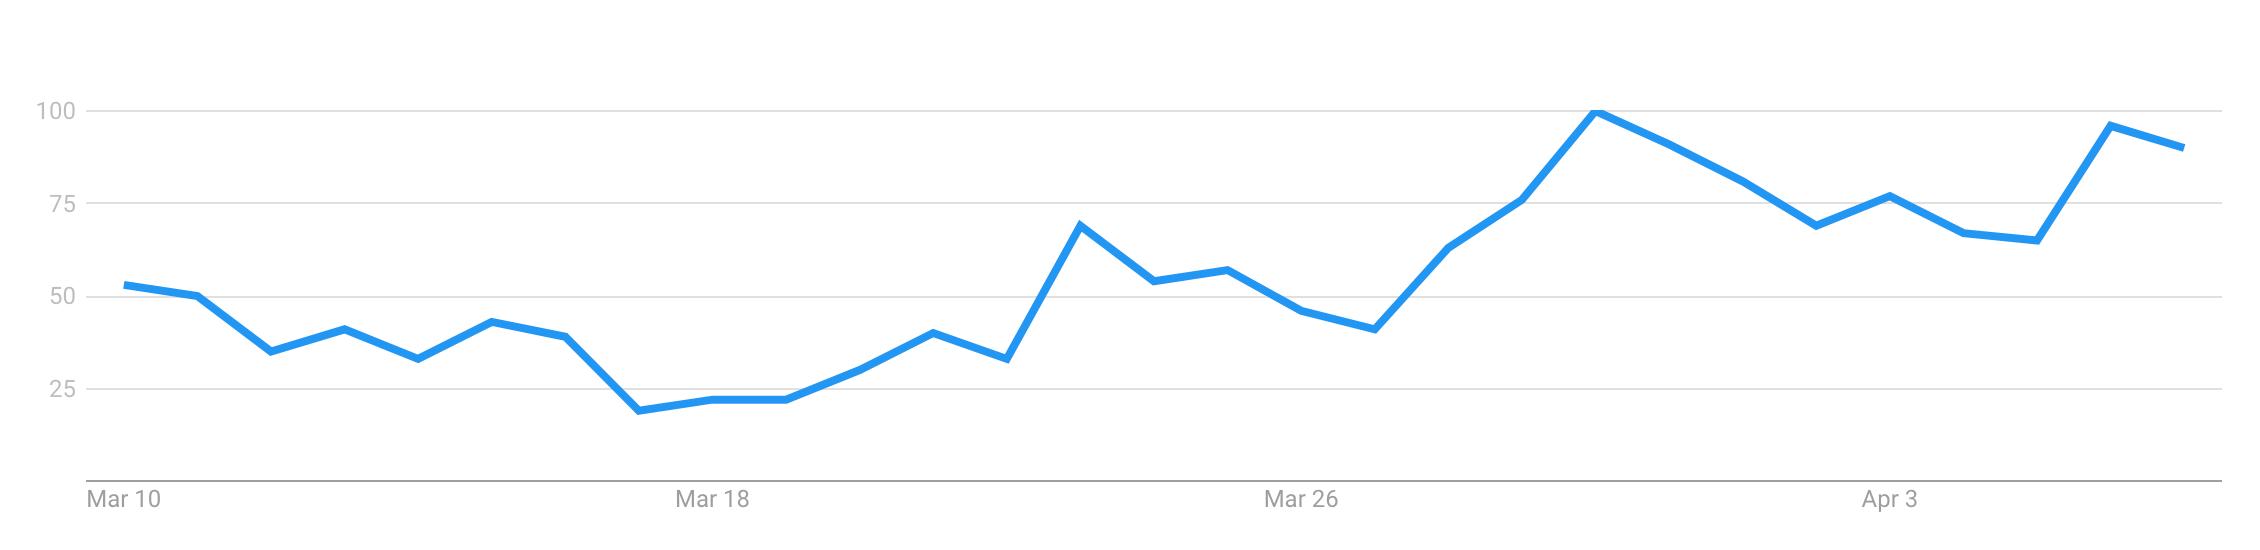 prospectus_-_Explore_-_Google_Trends